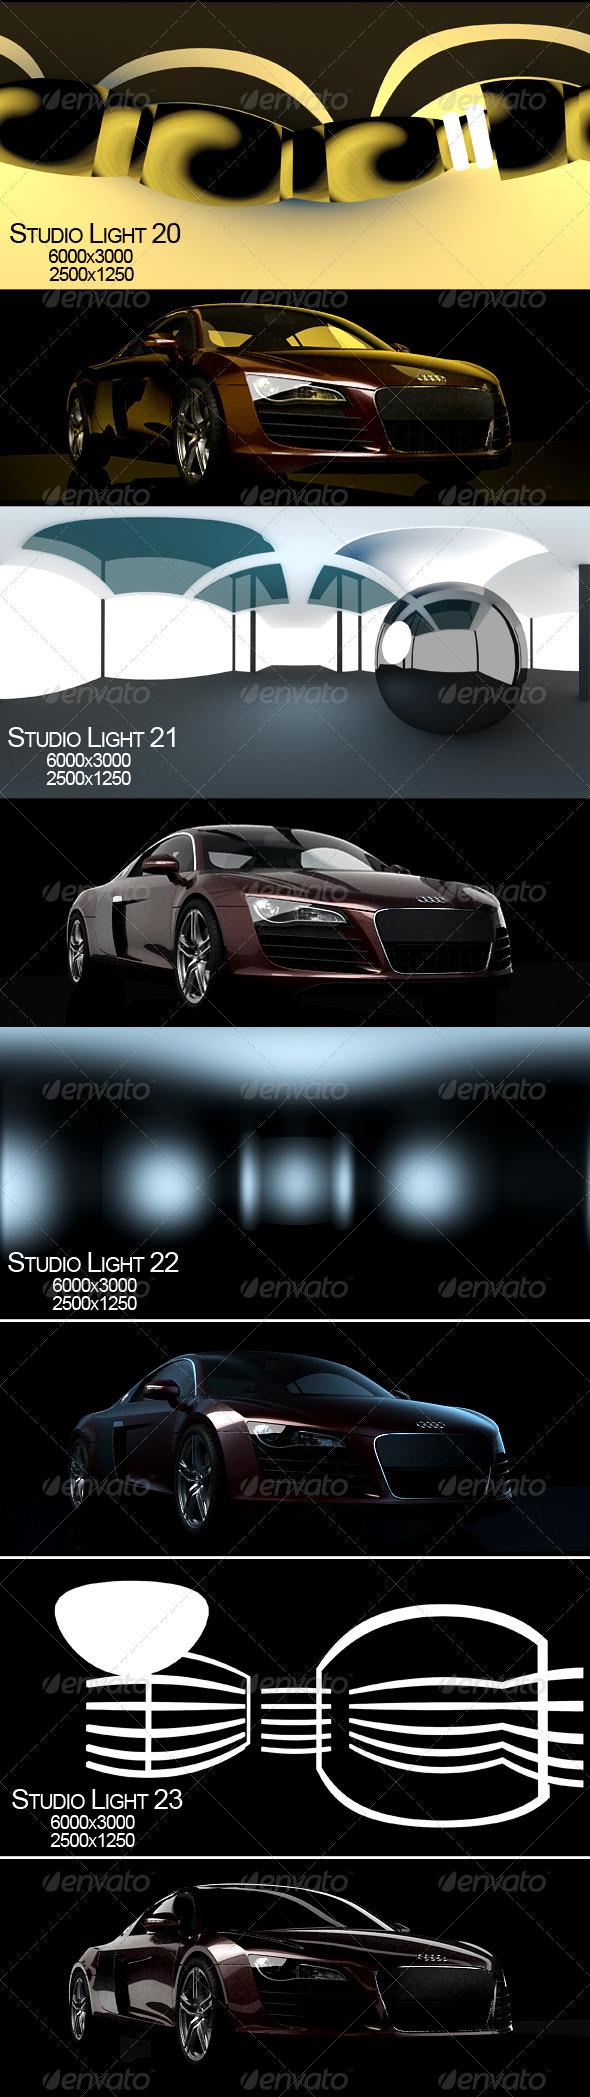 Studio light 6 - 3DOcean Item for Sale